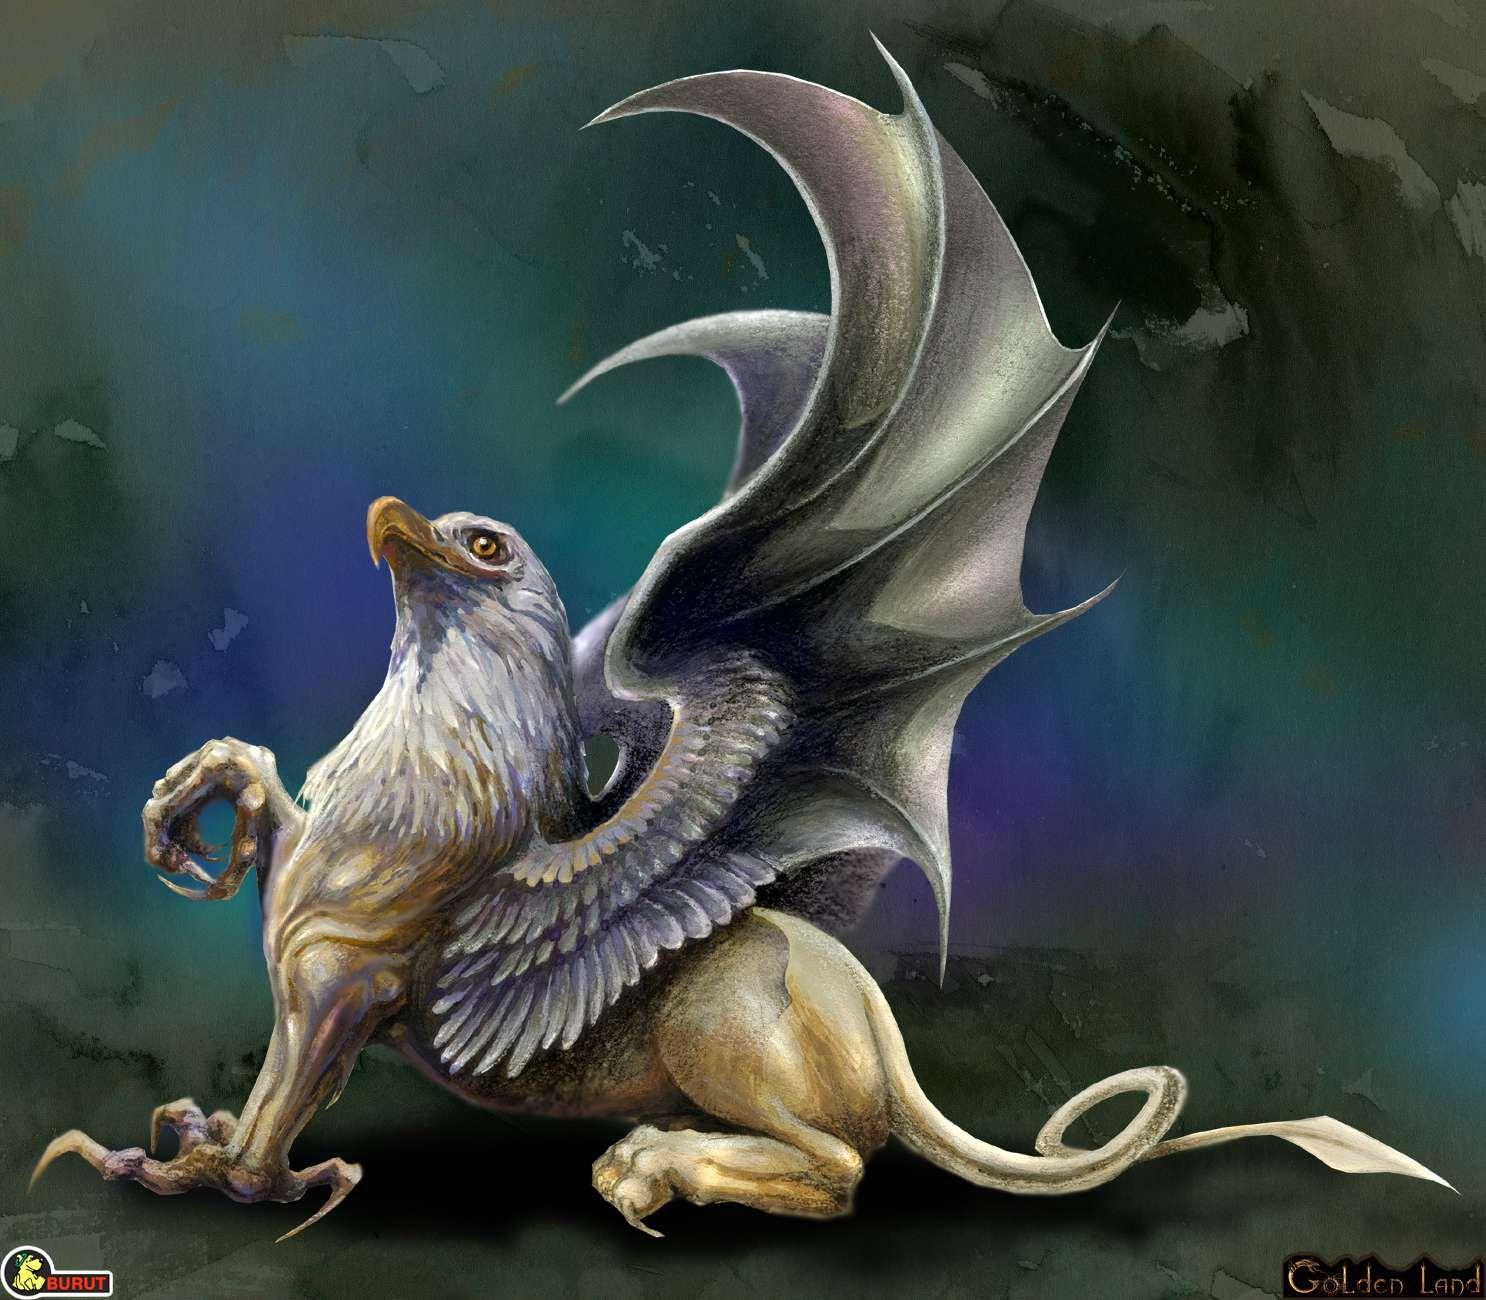 Archevore Com Distinctive Brand Name Mythological Creatures Mythical Creatures Magical Creatures